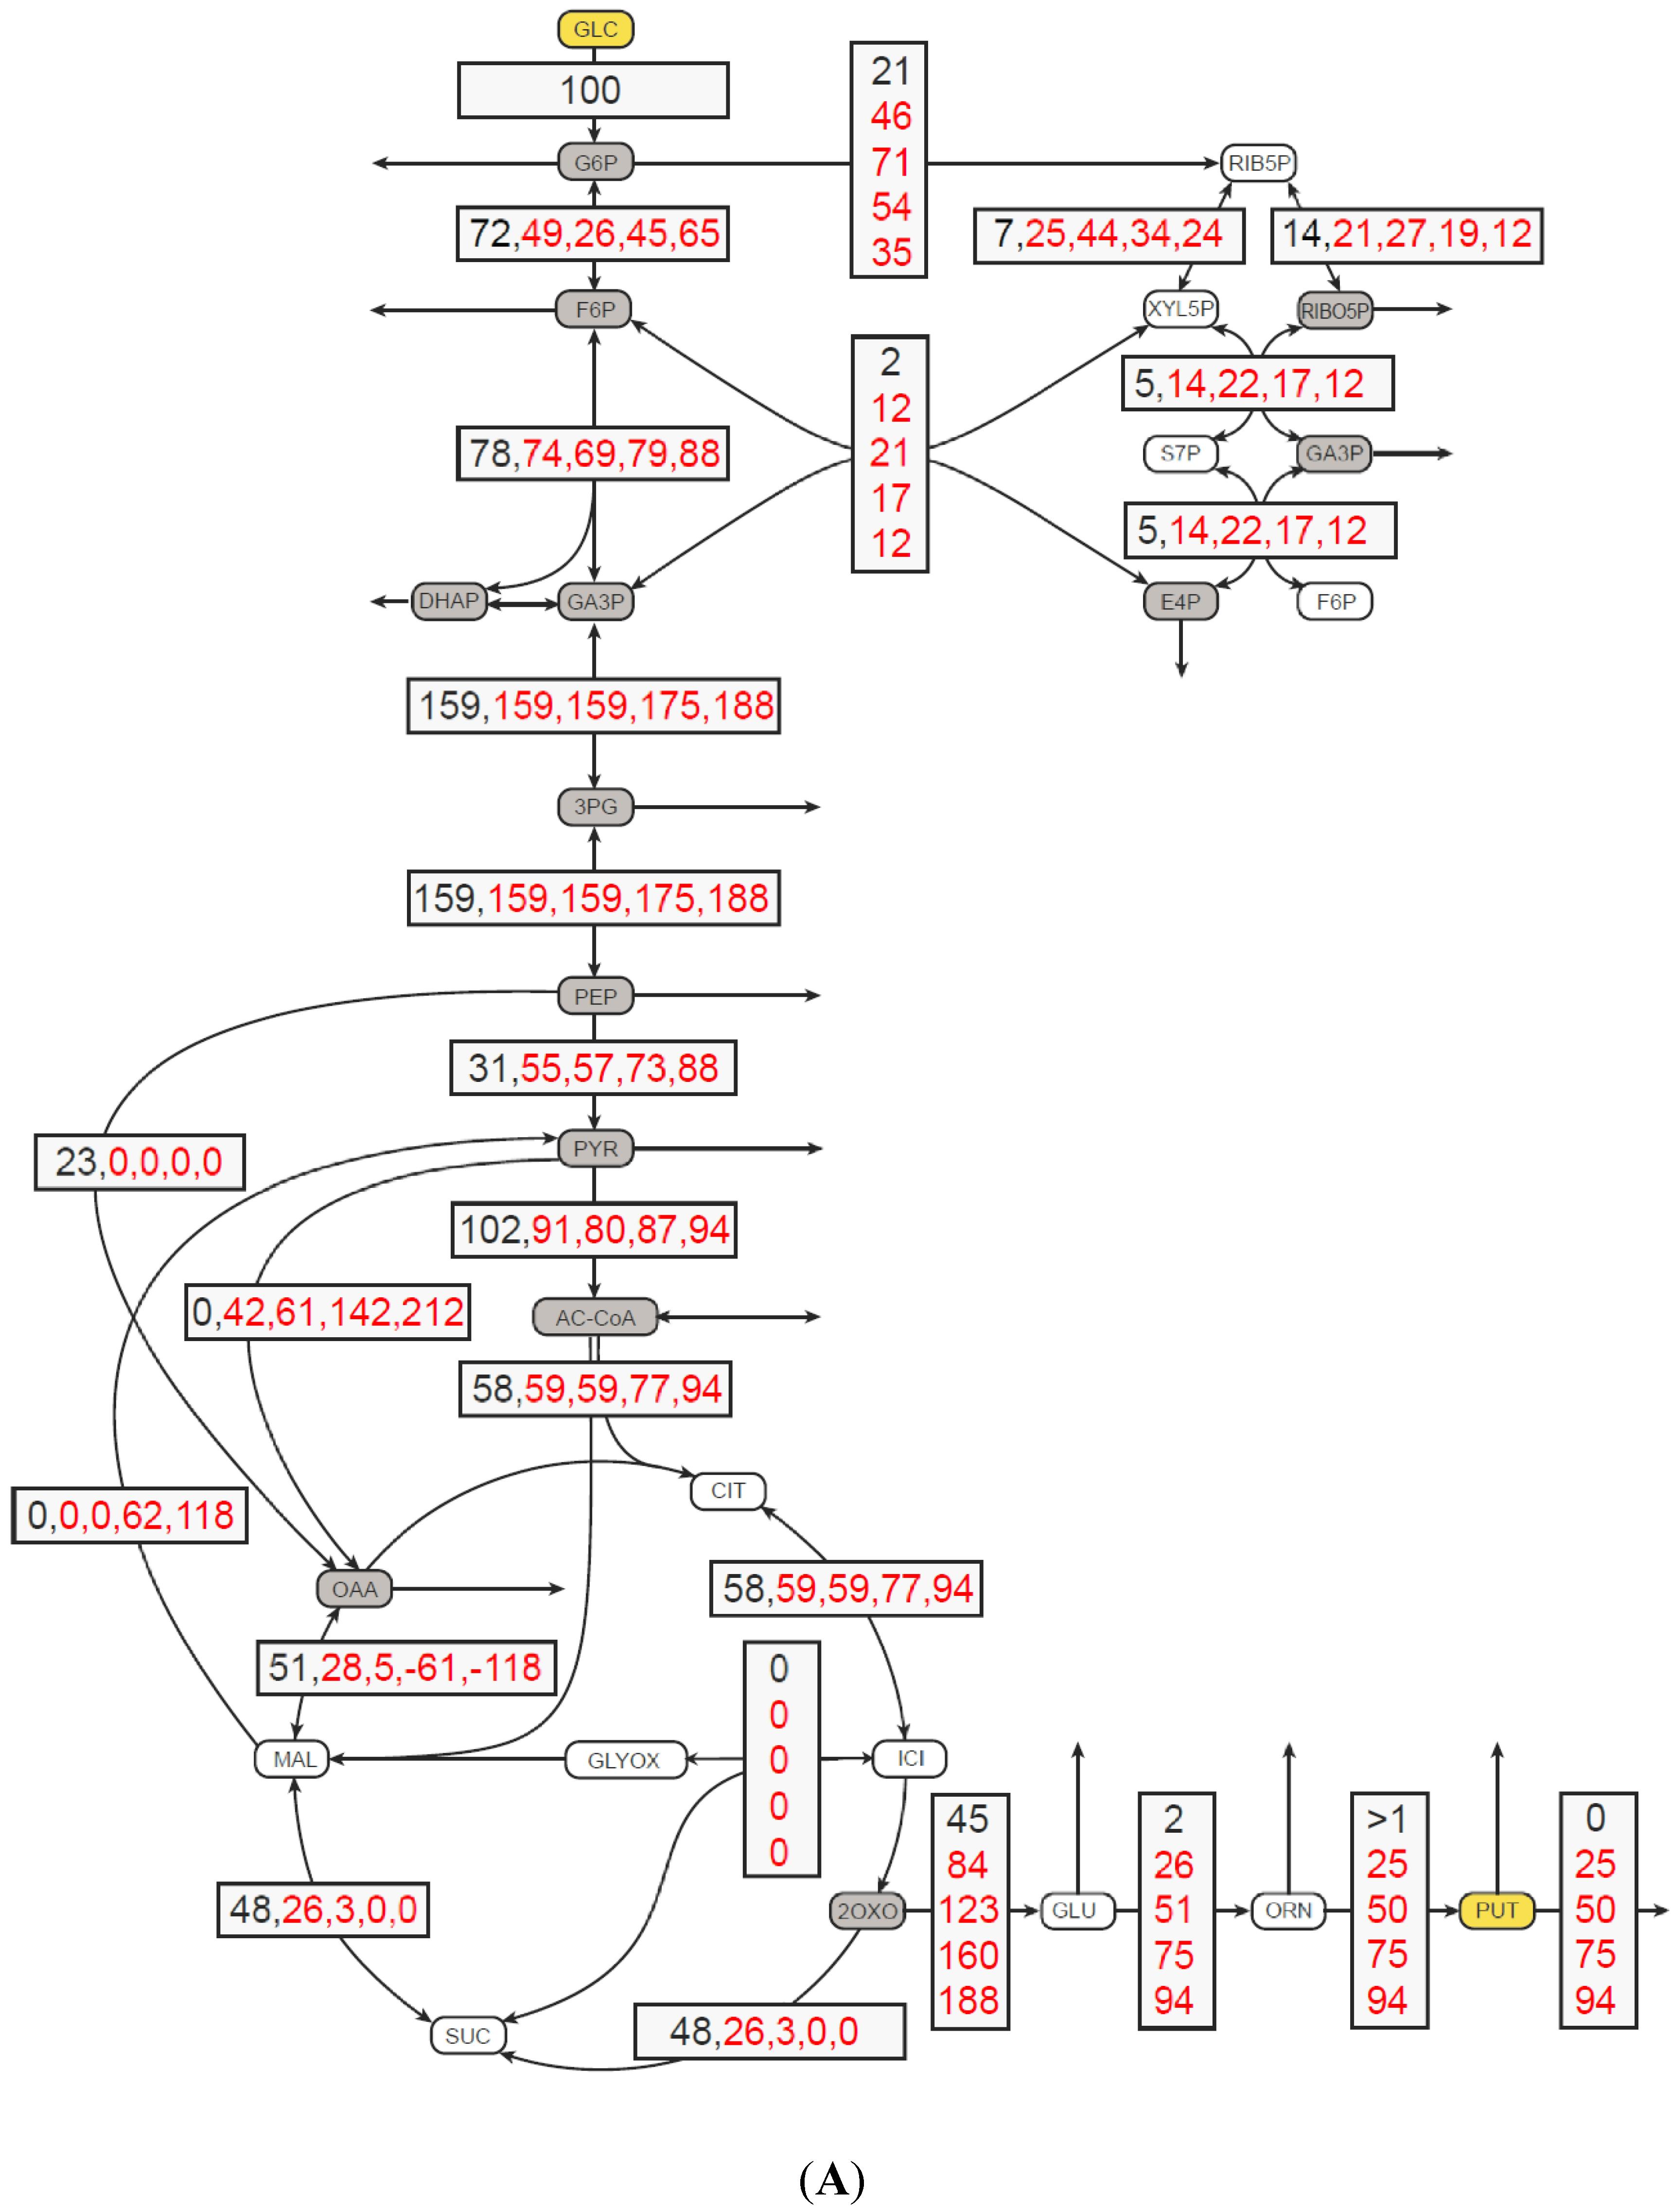 amino acid biosynthesis pathways regulation and metabolic engineering wendisch volker f